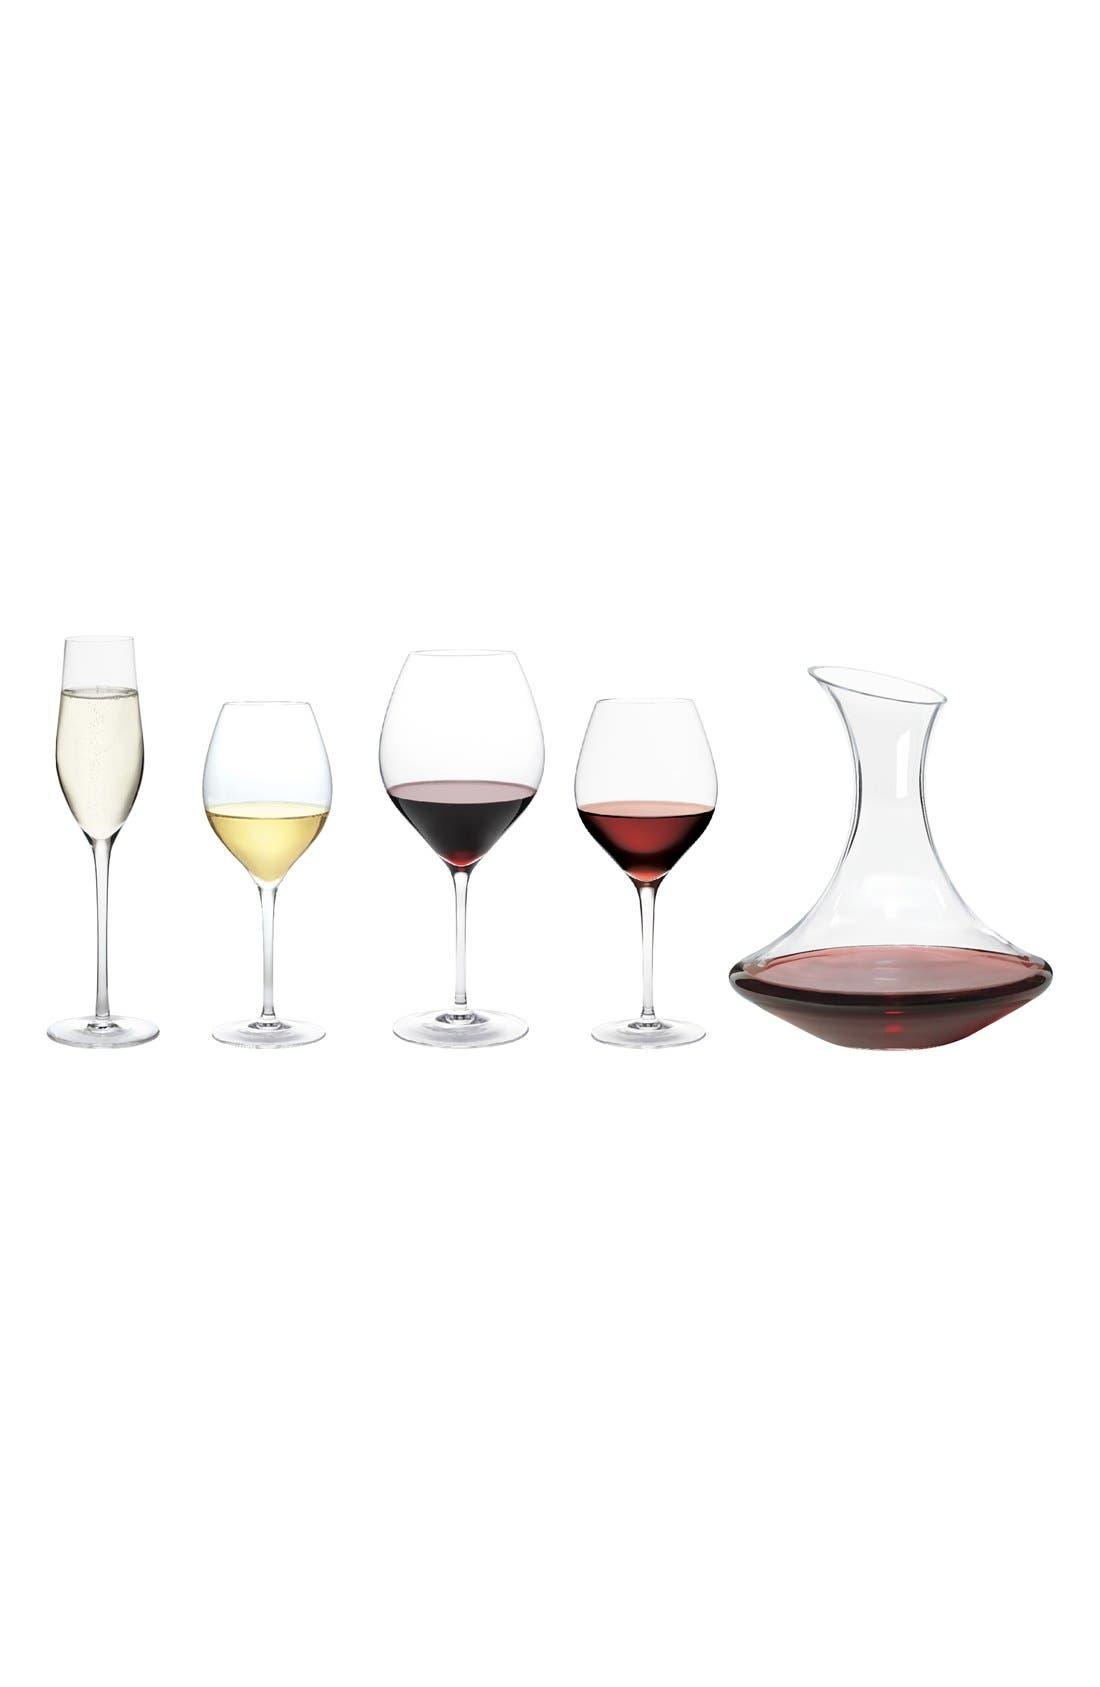 Ravenna Set of 4 Red Wine Glasses,                             Alternate thumbnail 2, color,                             No Color